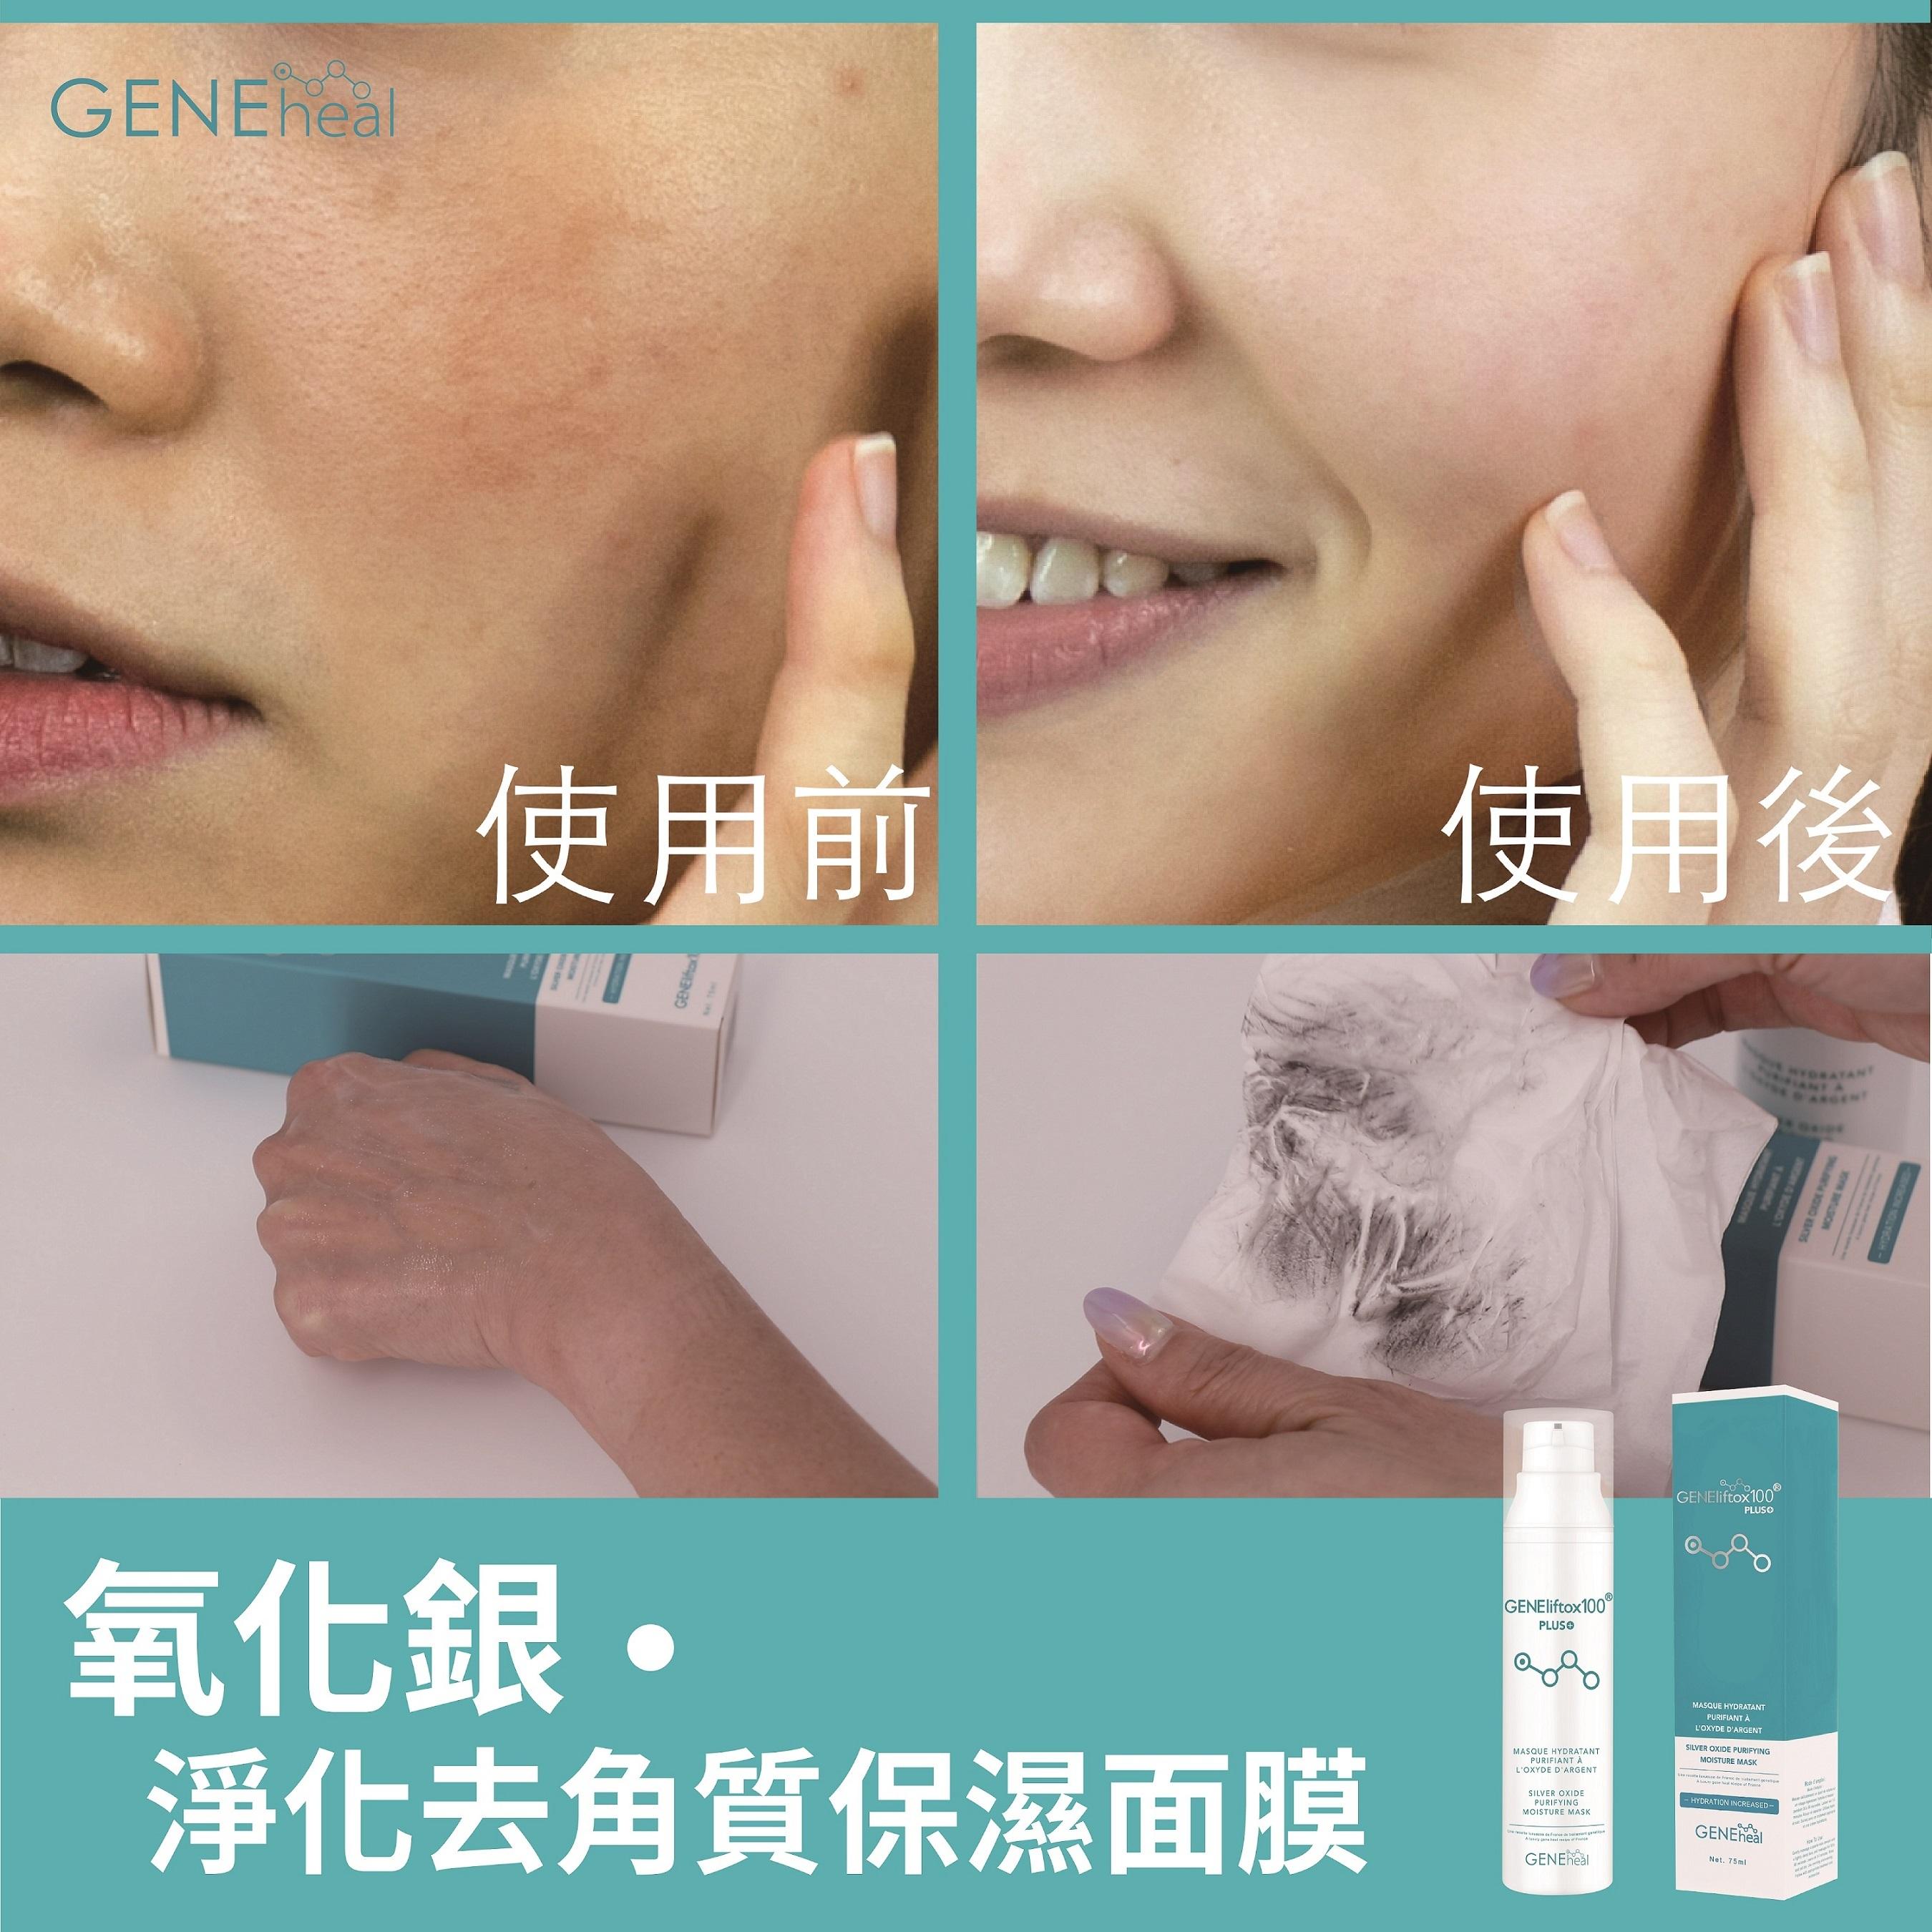 GENEliftox100- 氧化銀 . 淨化去角質保濕面膜(加強保濕版) - 氧化銀嬰兒面膜